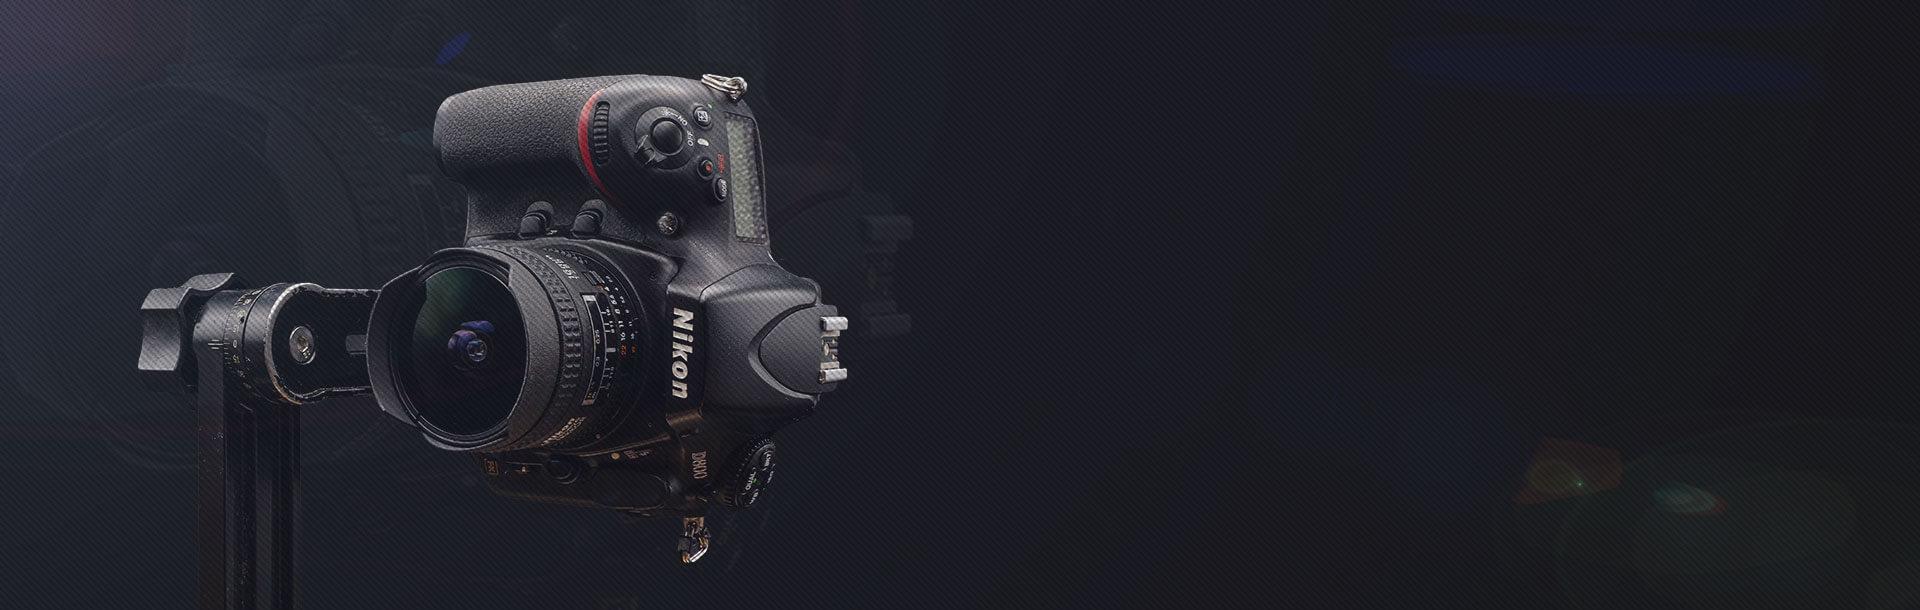 Nodal Ninja Nikon D800